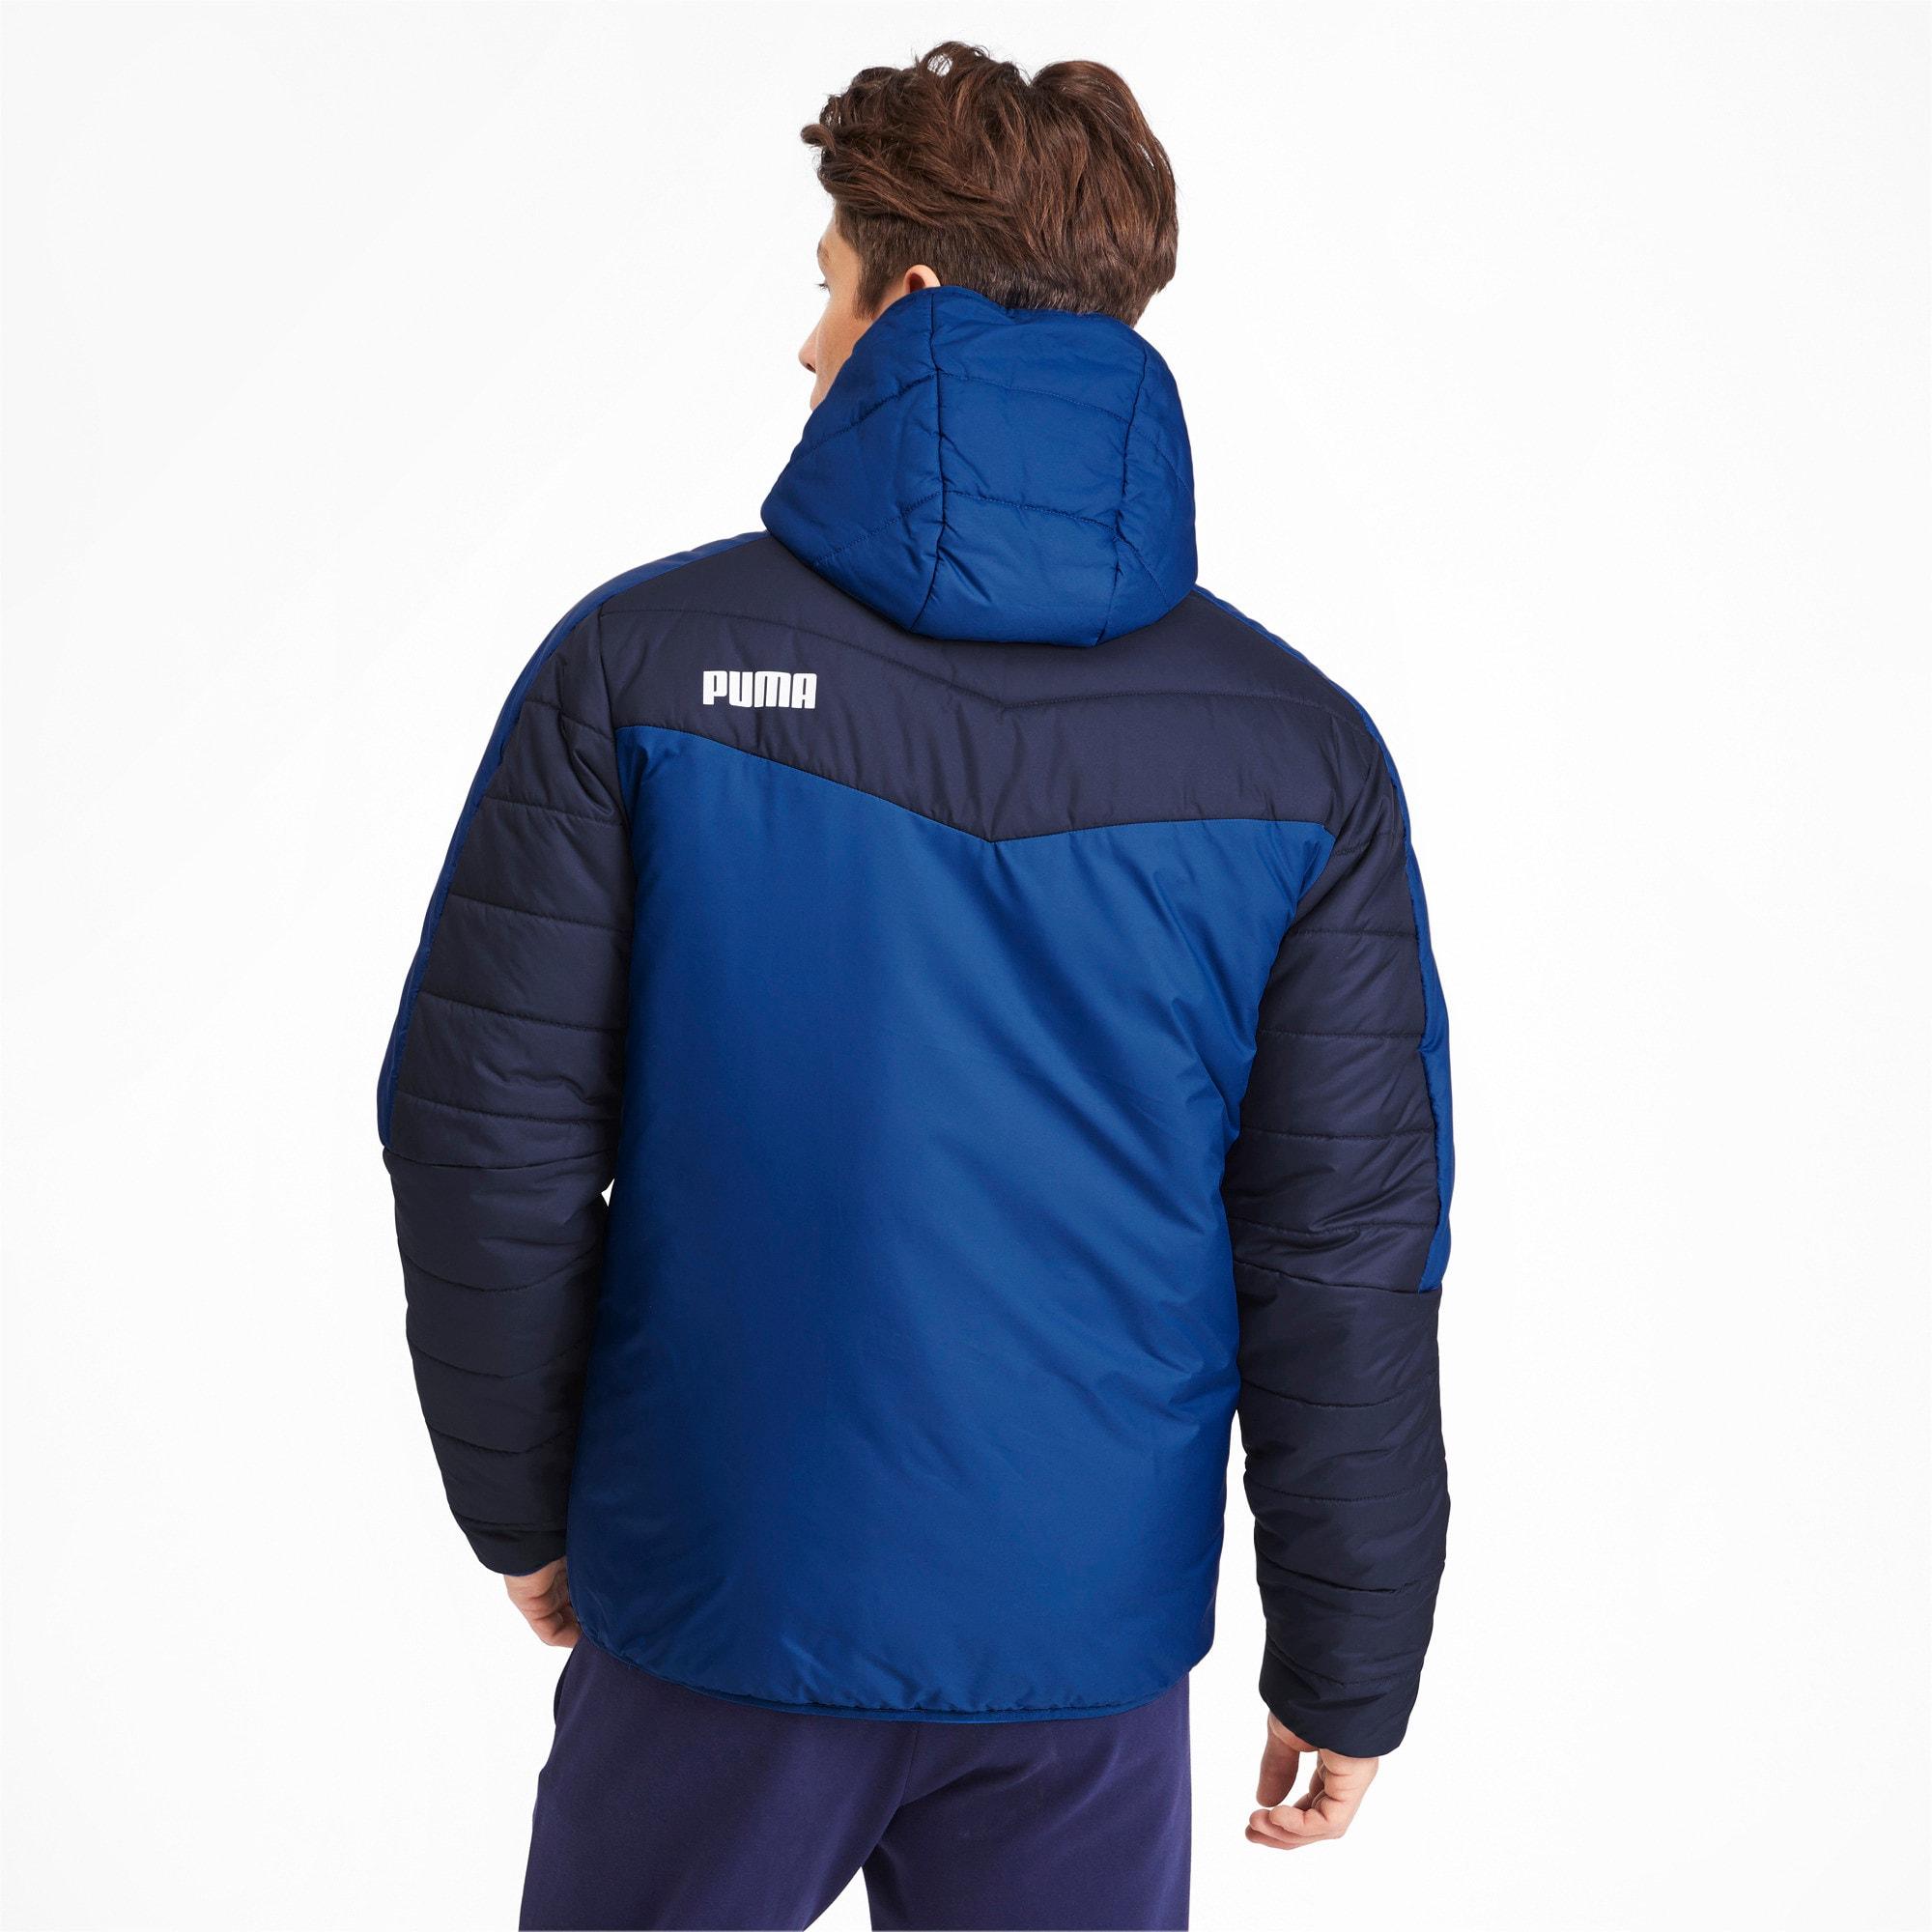 Thumbnail 3 of warmCELL Men's Padded Jacket, Galaxy Blue-Peacoat, medium